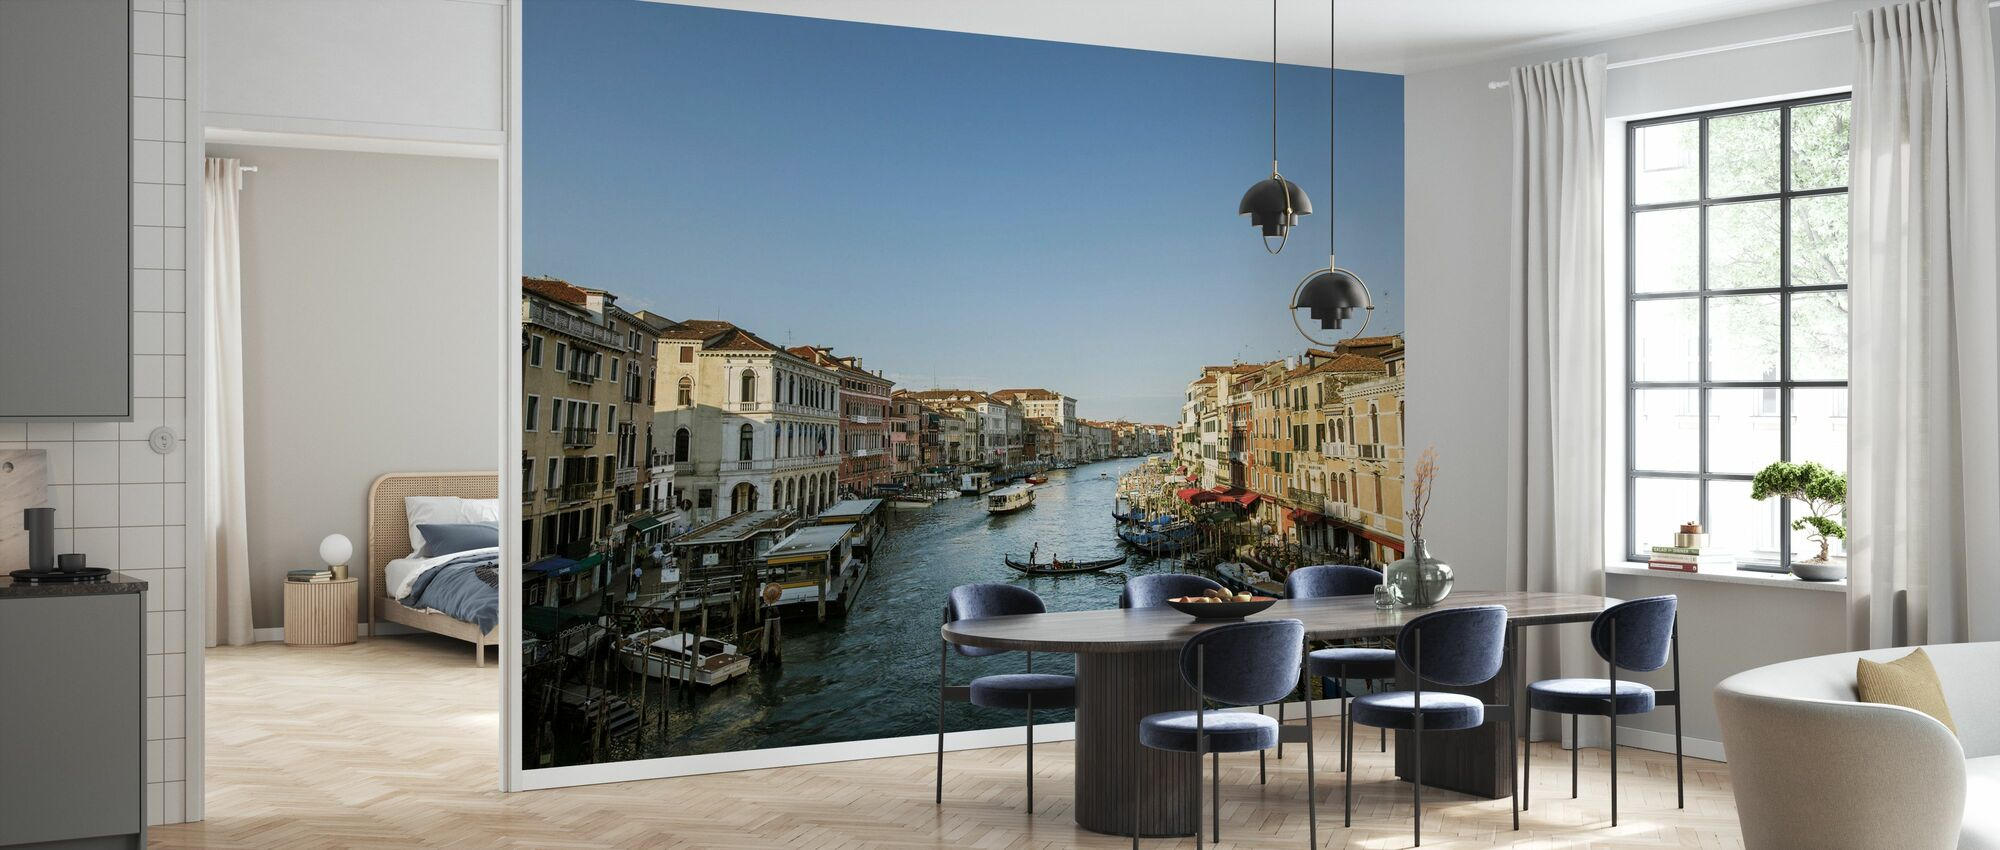 Blue Sky over Venice - Wallpaper - Kitchen